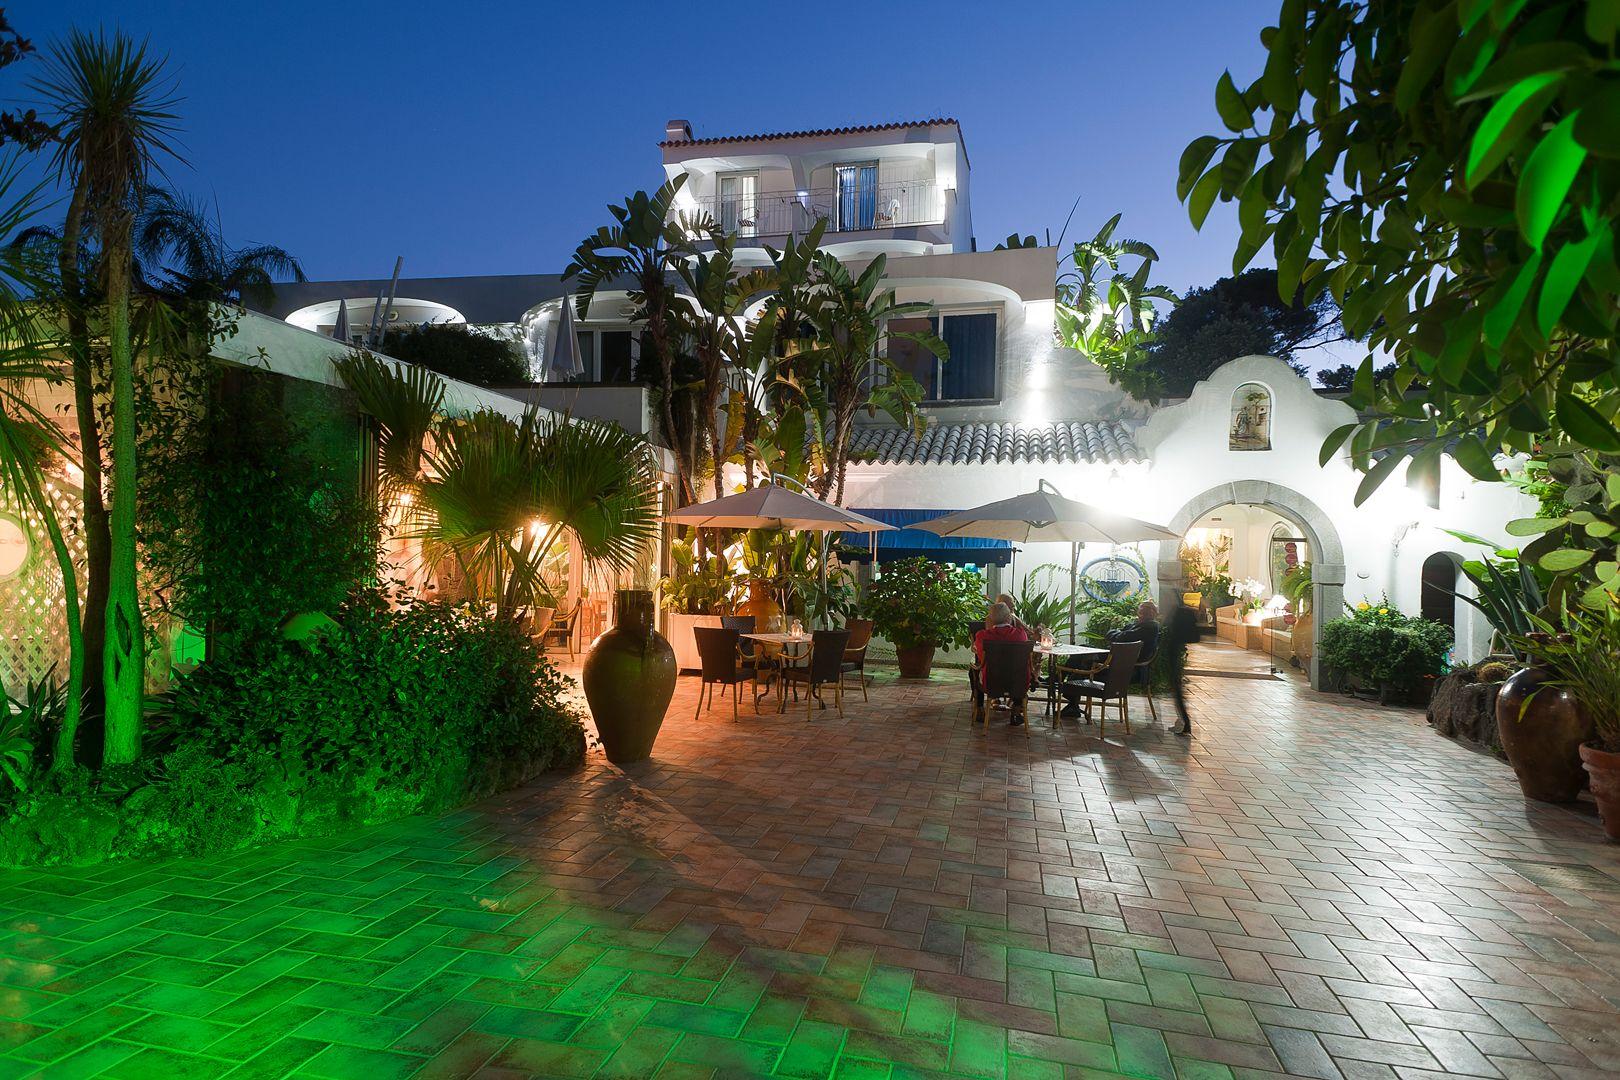 Hotel-central-park-ischia-4